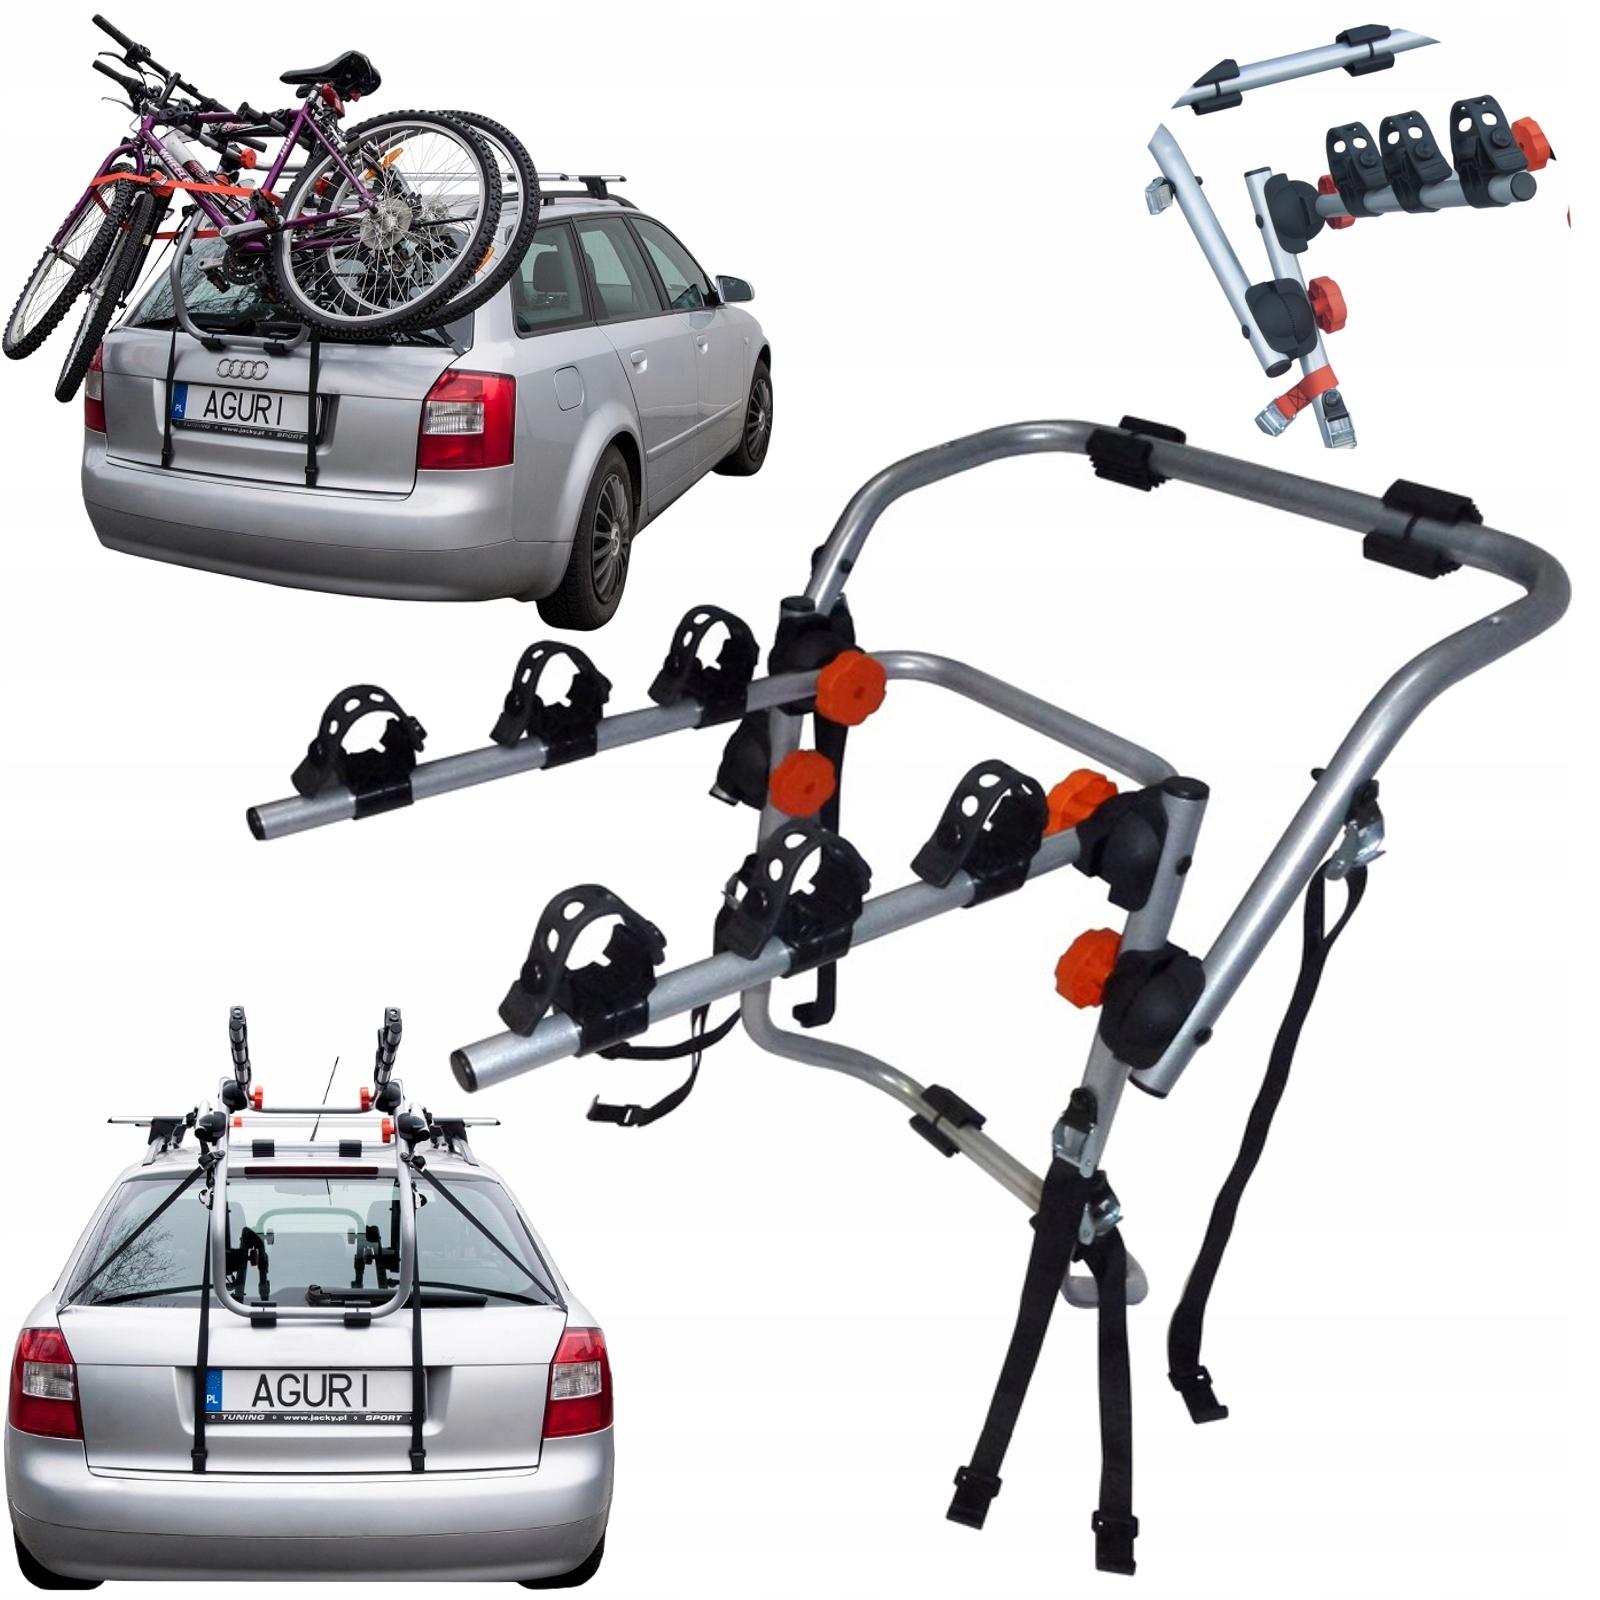 AGURI SPIDER 3 SILVER Bagażnik rowerowy na klapę